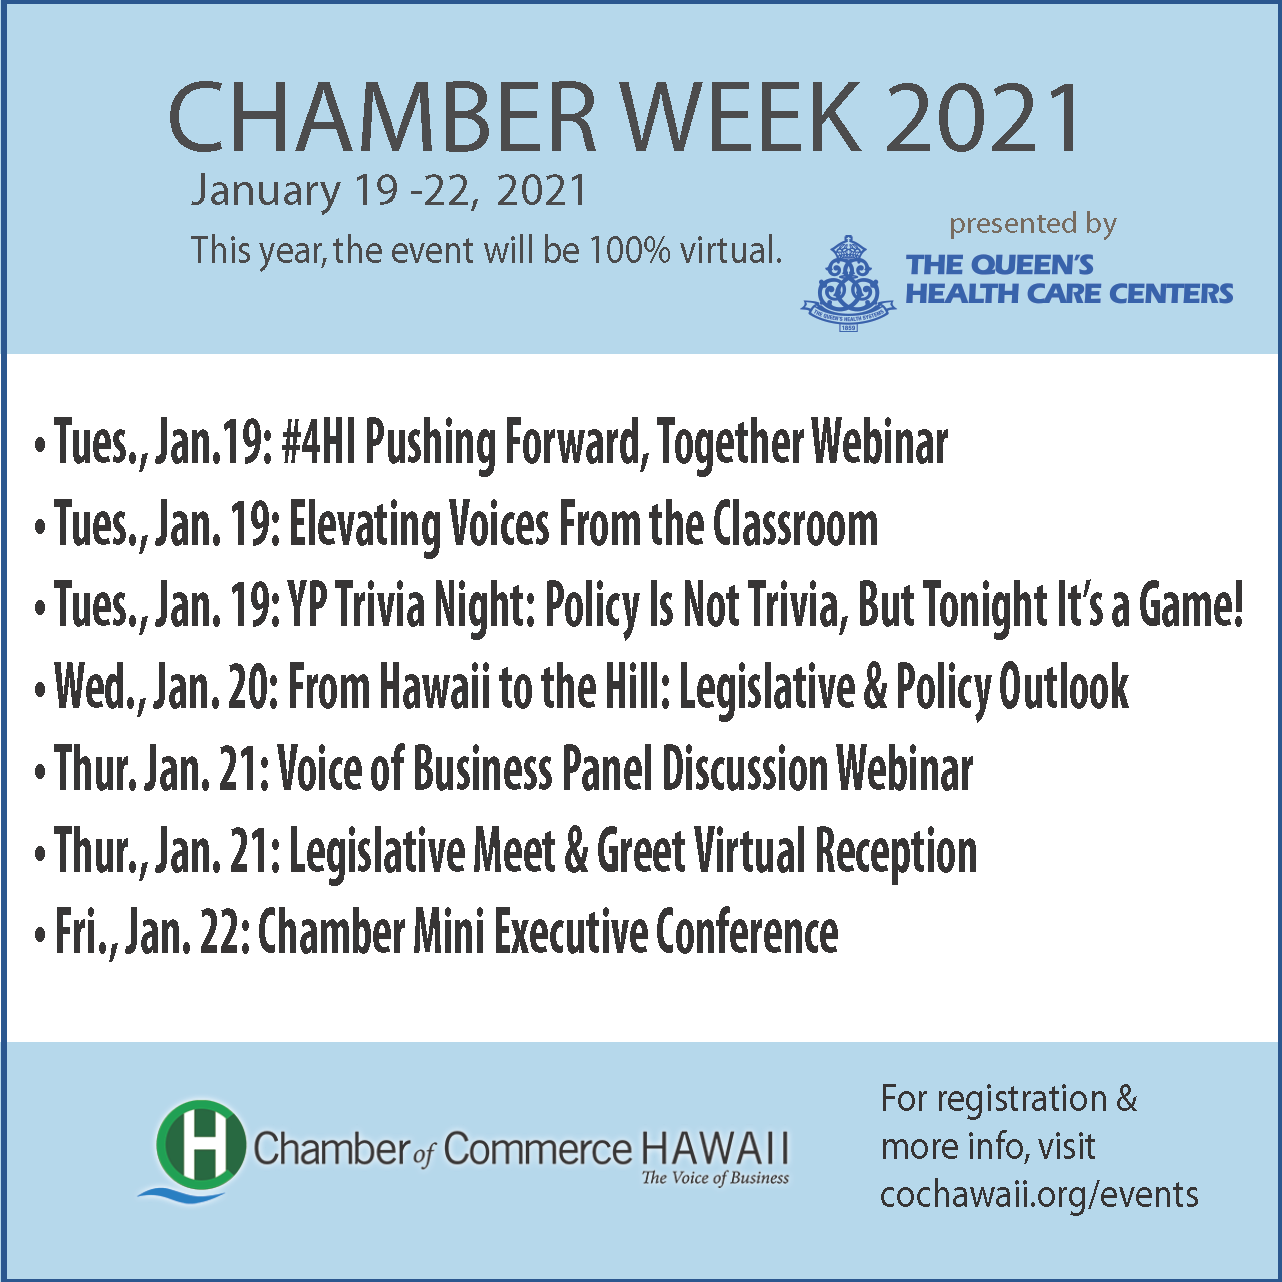 Chamber Week 2021